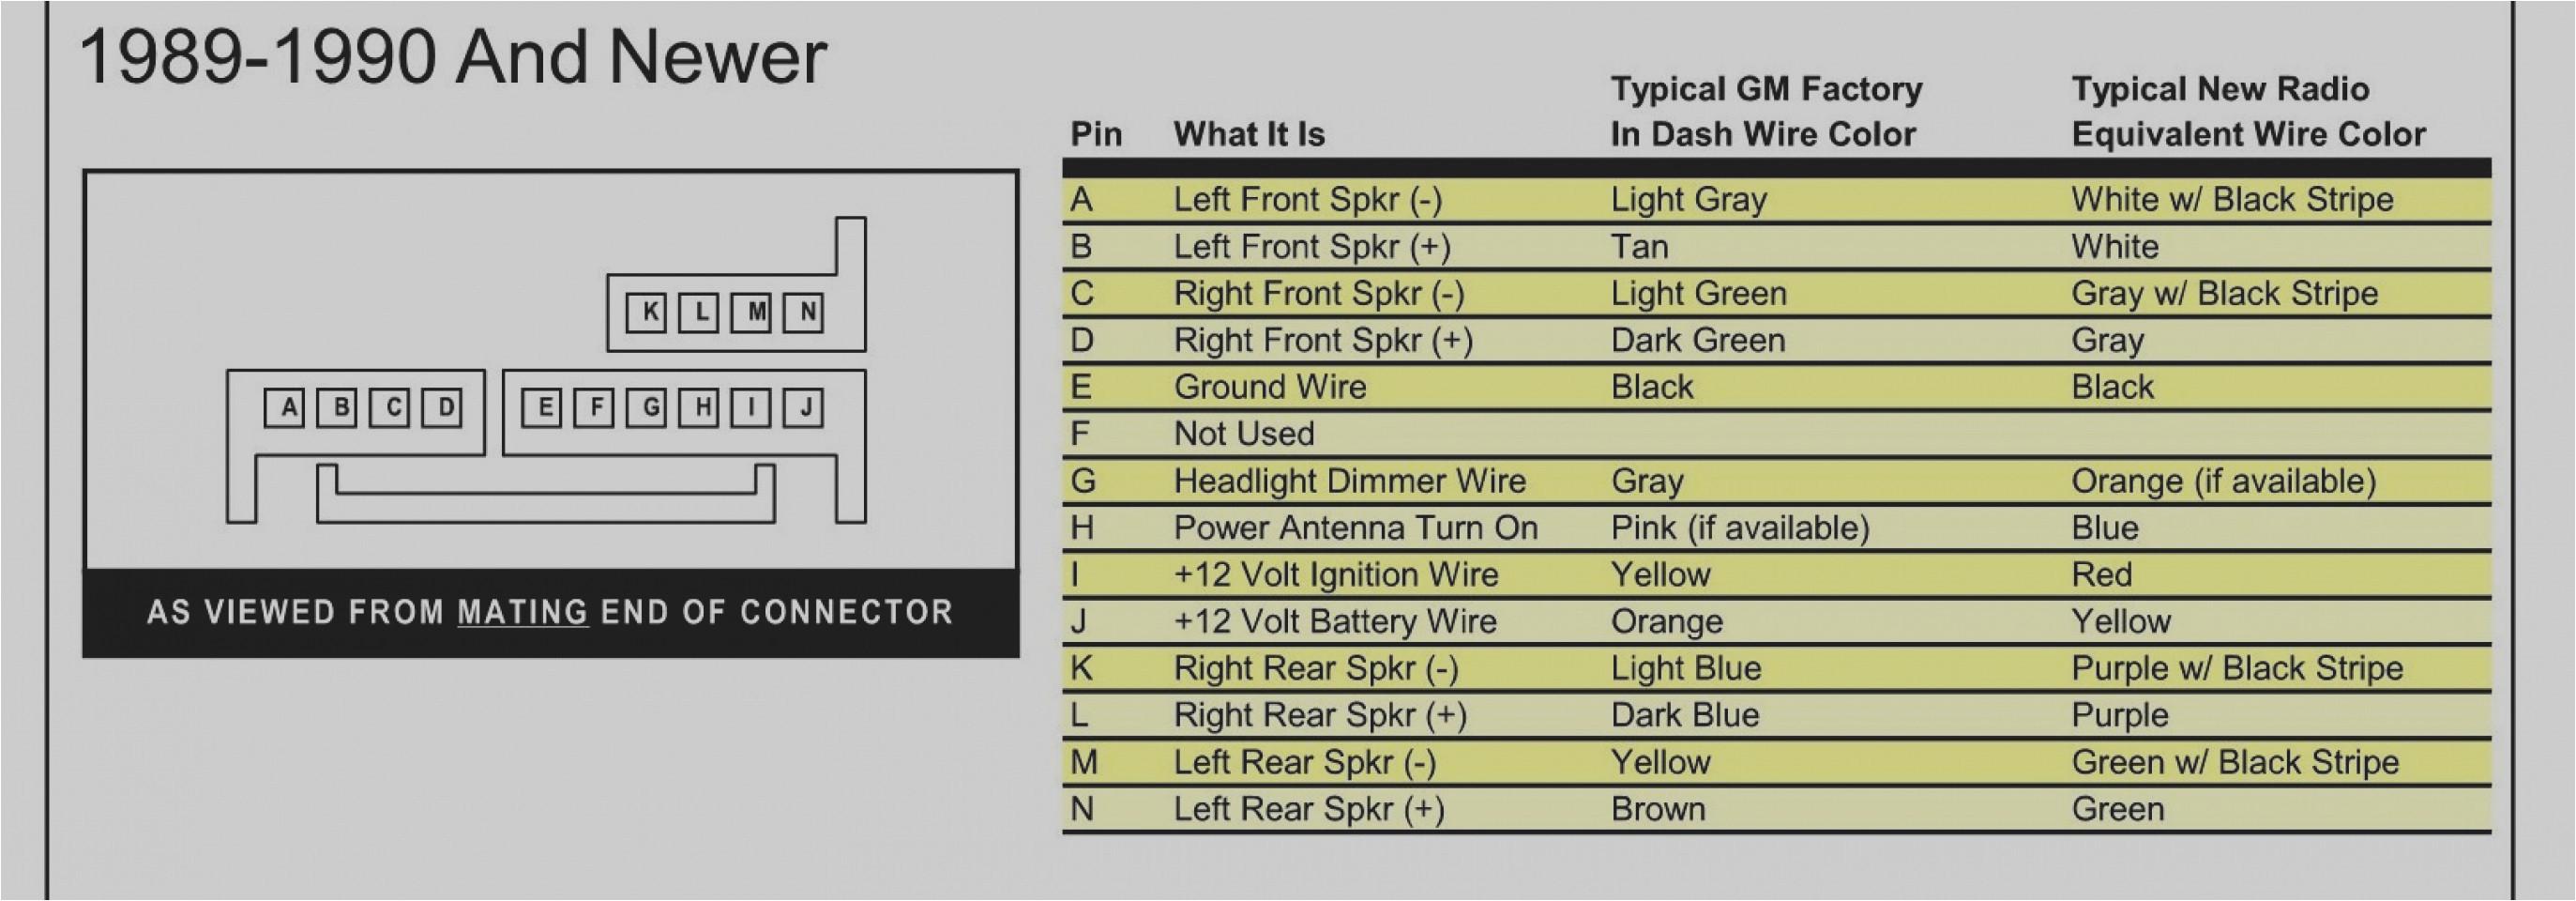 2002 chevy cavalier radio wiring harness diagram best of 2007 chevy trailblazer radio wiring chevrolet wiring diagrams of 2002 chevy cavalier radio wiring harness diagram jpg